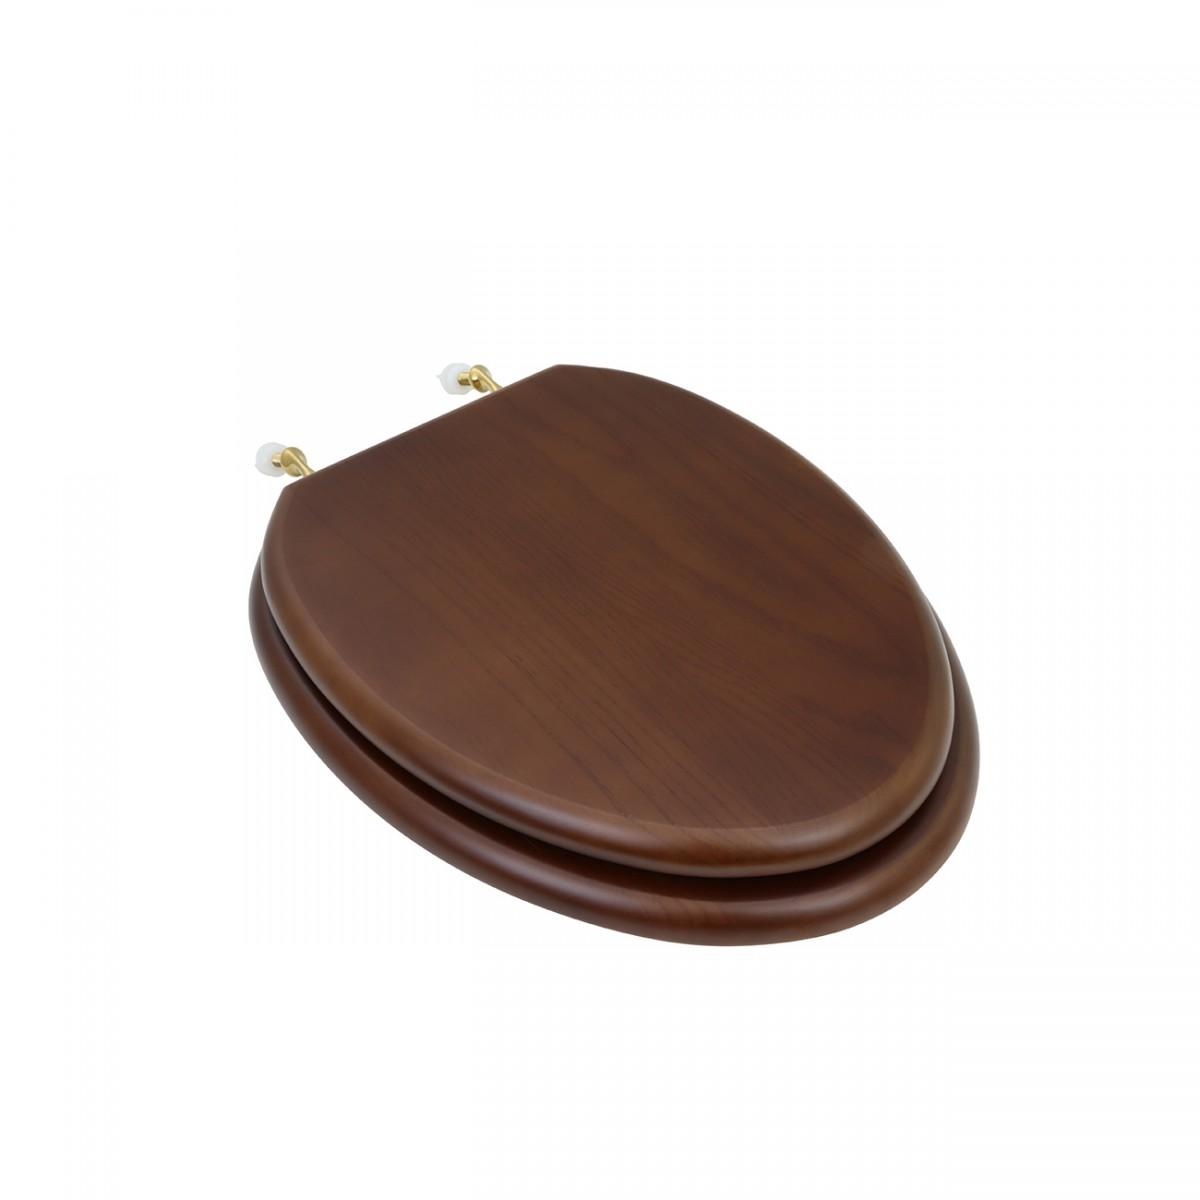 Toilet seat elongated solid wood dark oak brass hinge for Toilet seat